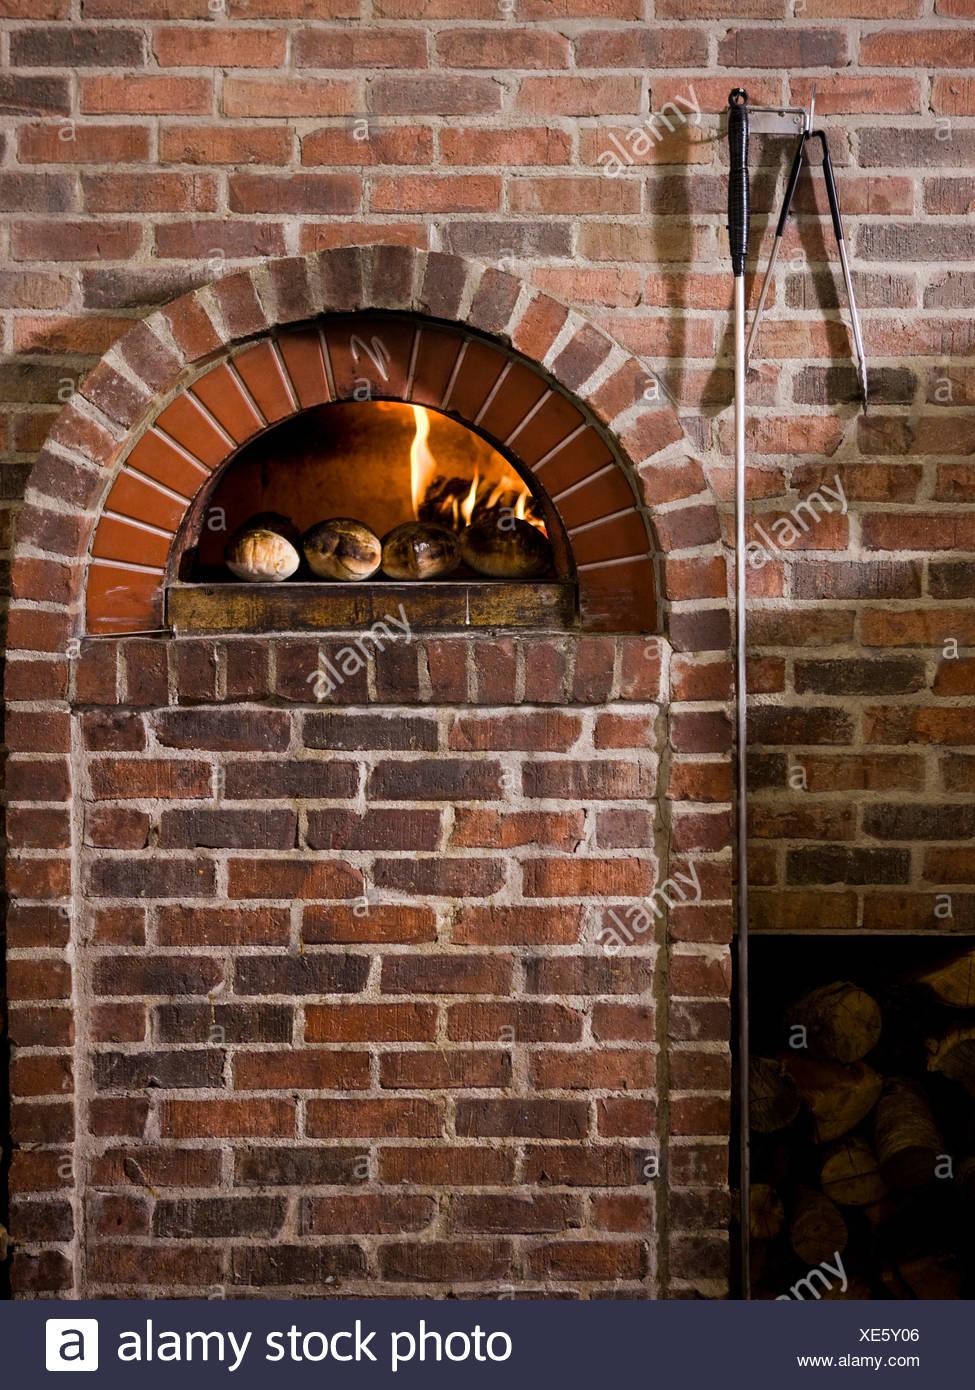 USA, Utah, Orem, logs by brick fireplace - Stock Image